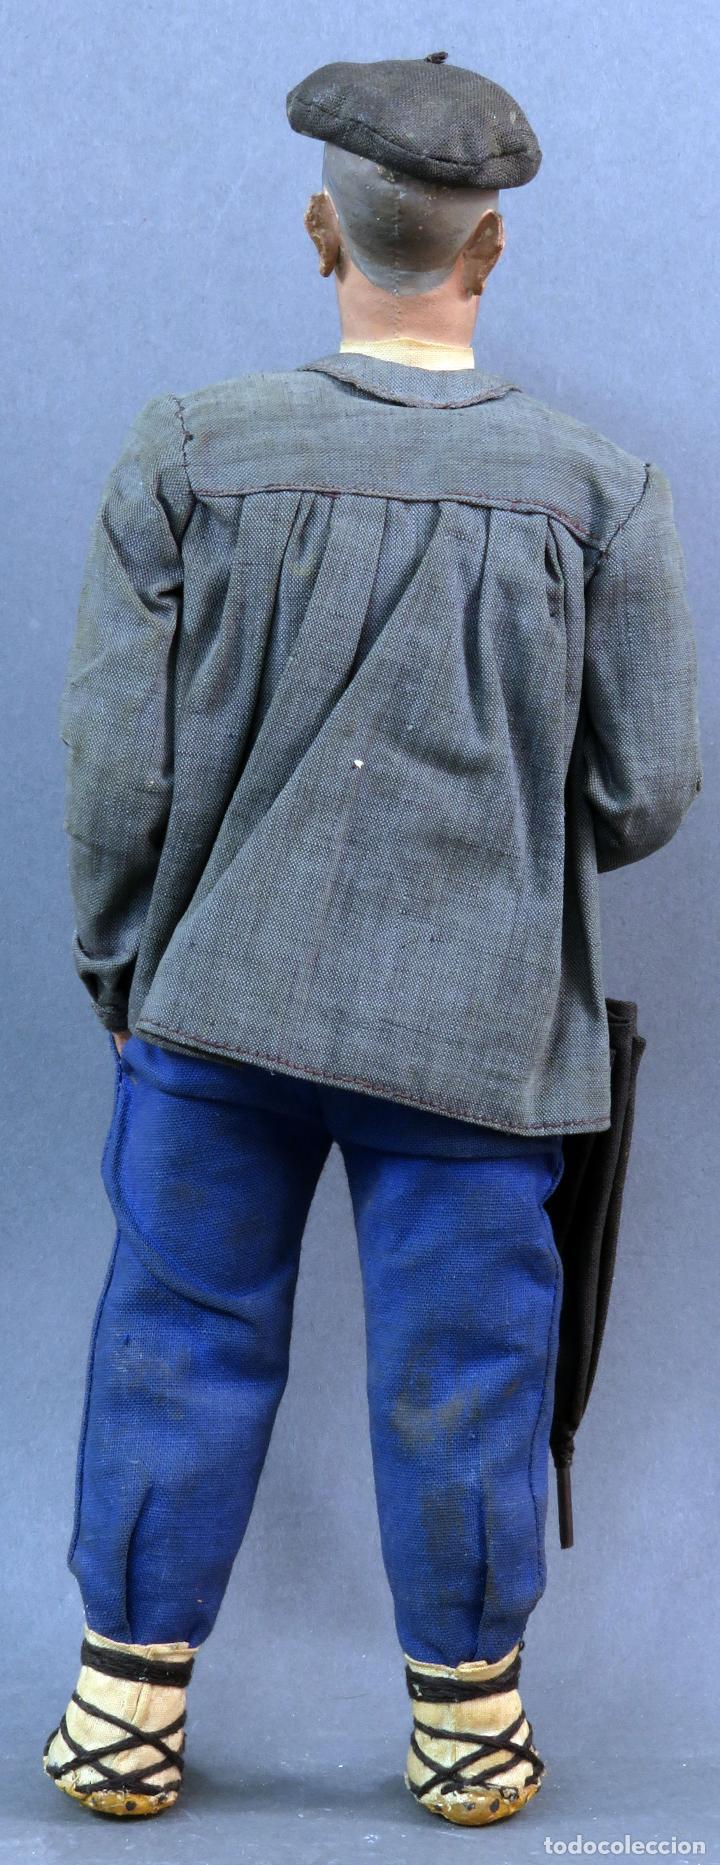 Muñeca española clasica: Paisano vasco boina paraguas cartón piedra piel y trapo años 30 30 cm alto - Foto 4 - 125831975